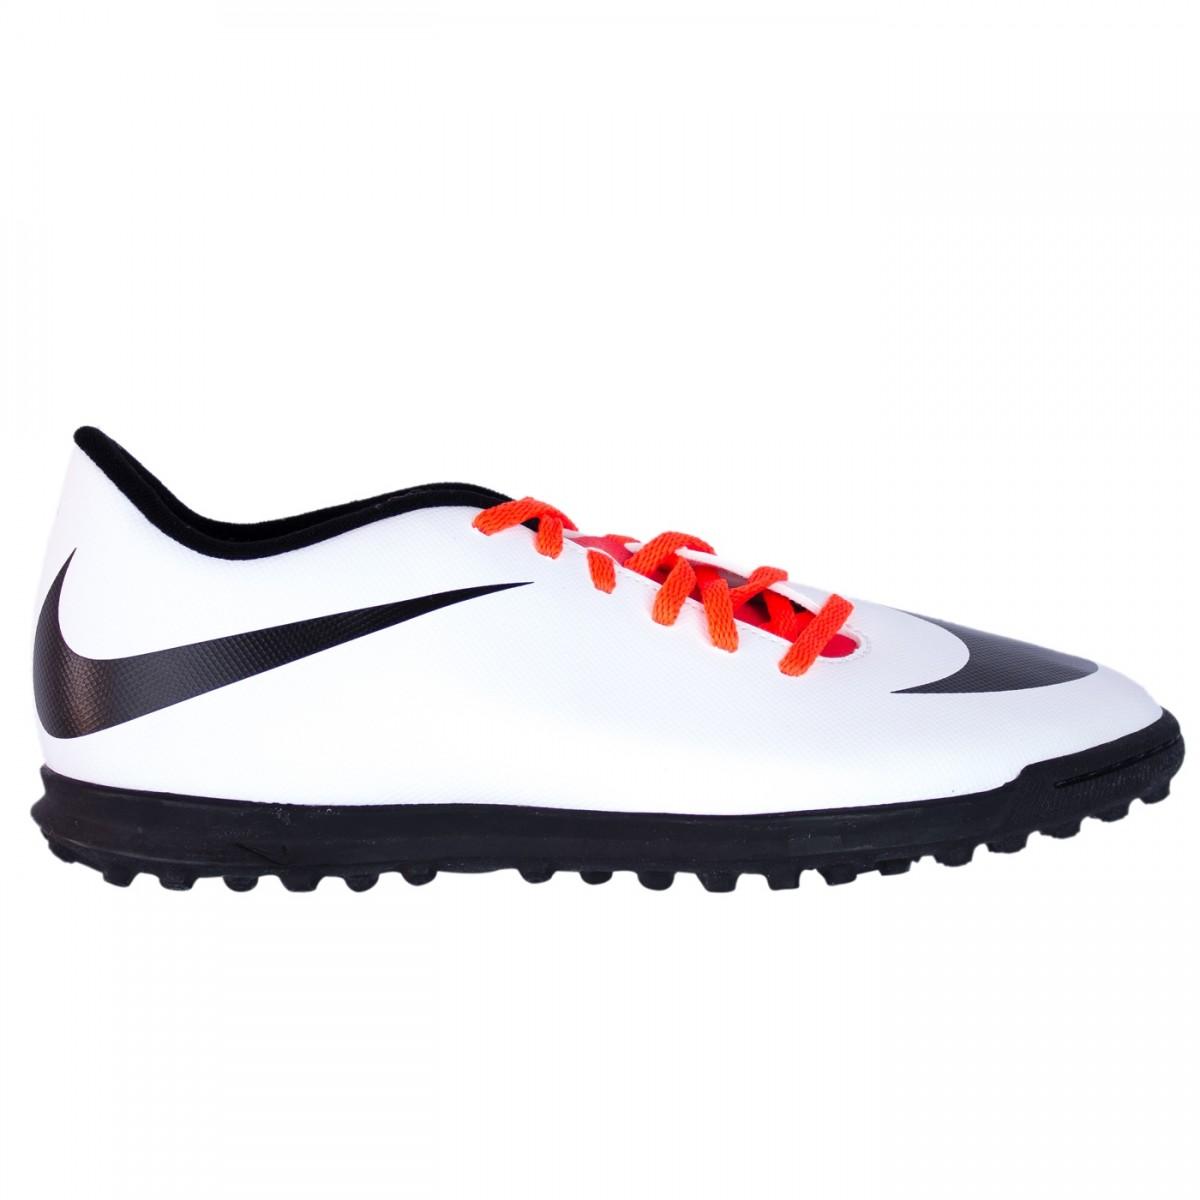 2e135d13d2a1d Bizz Store - Chuteira Masculina Nike Bravata Society Branca